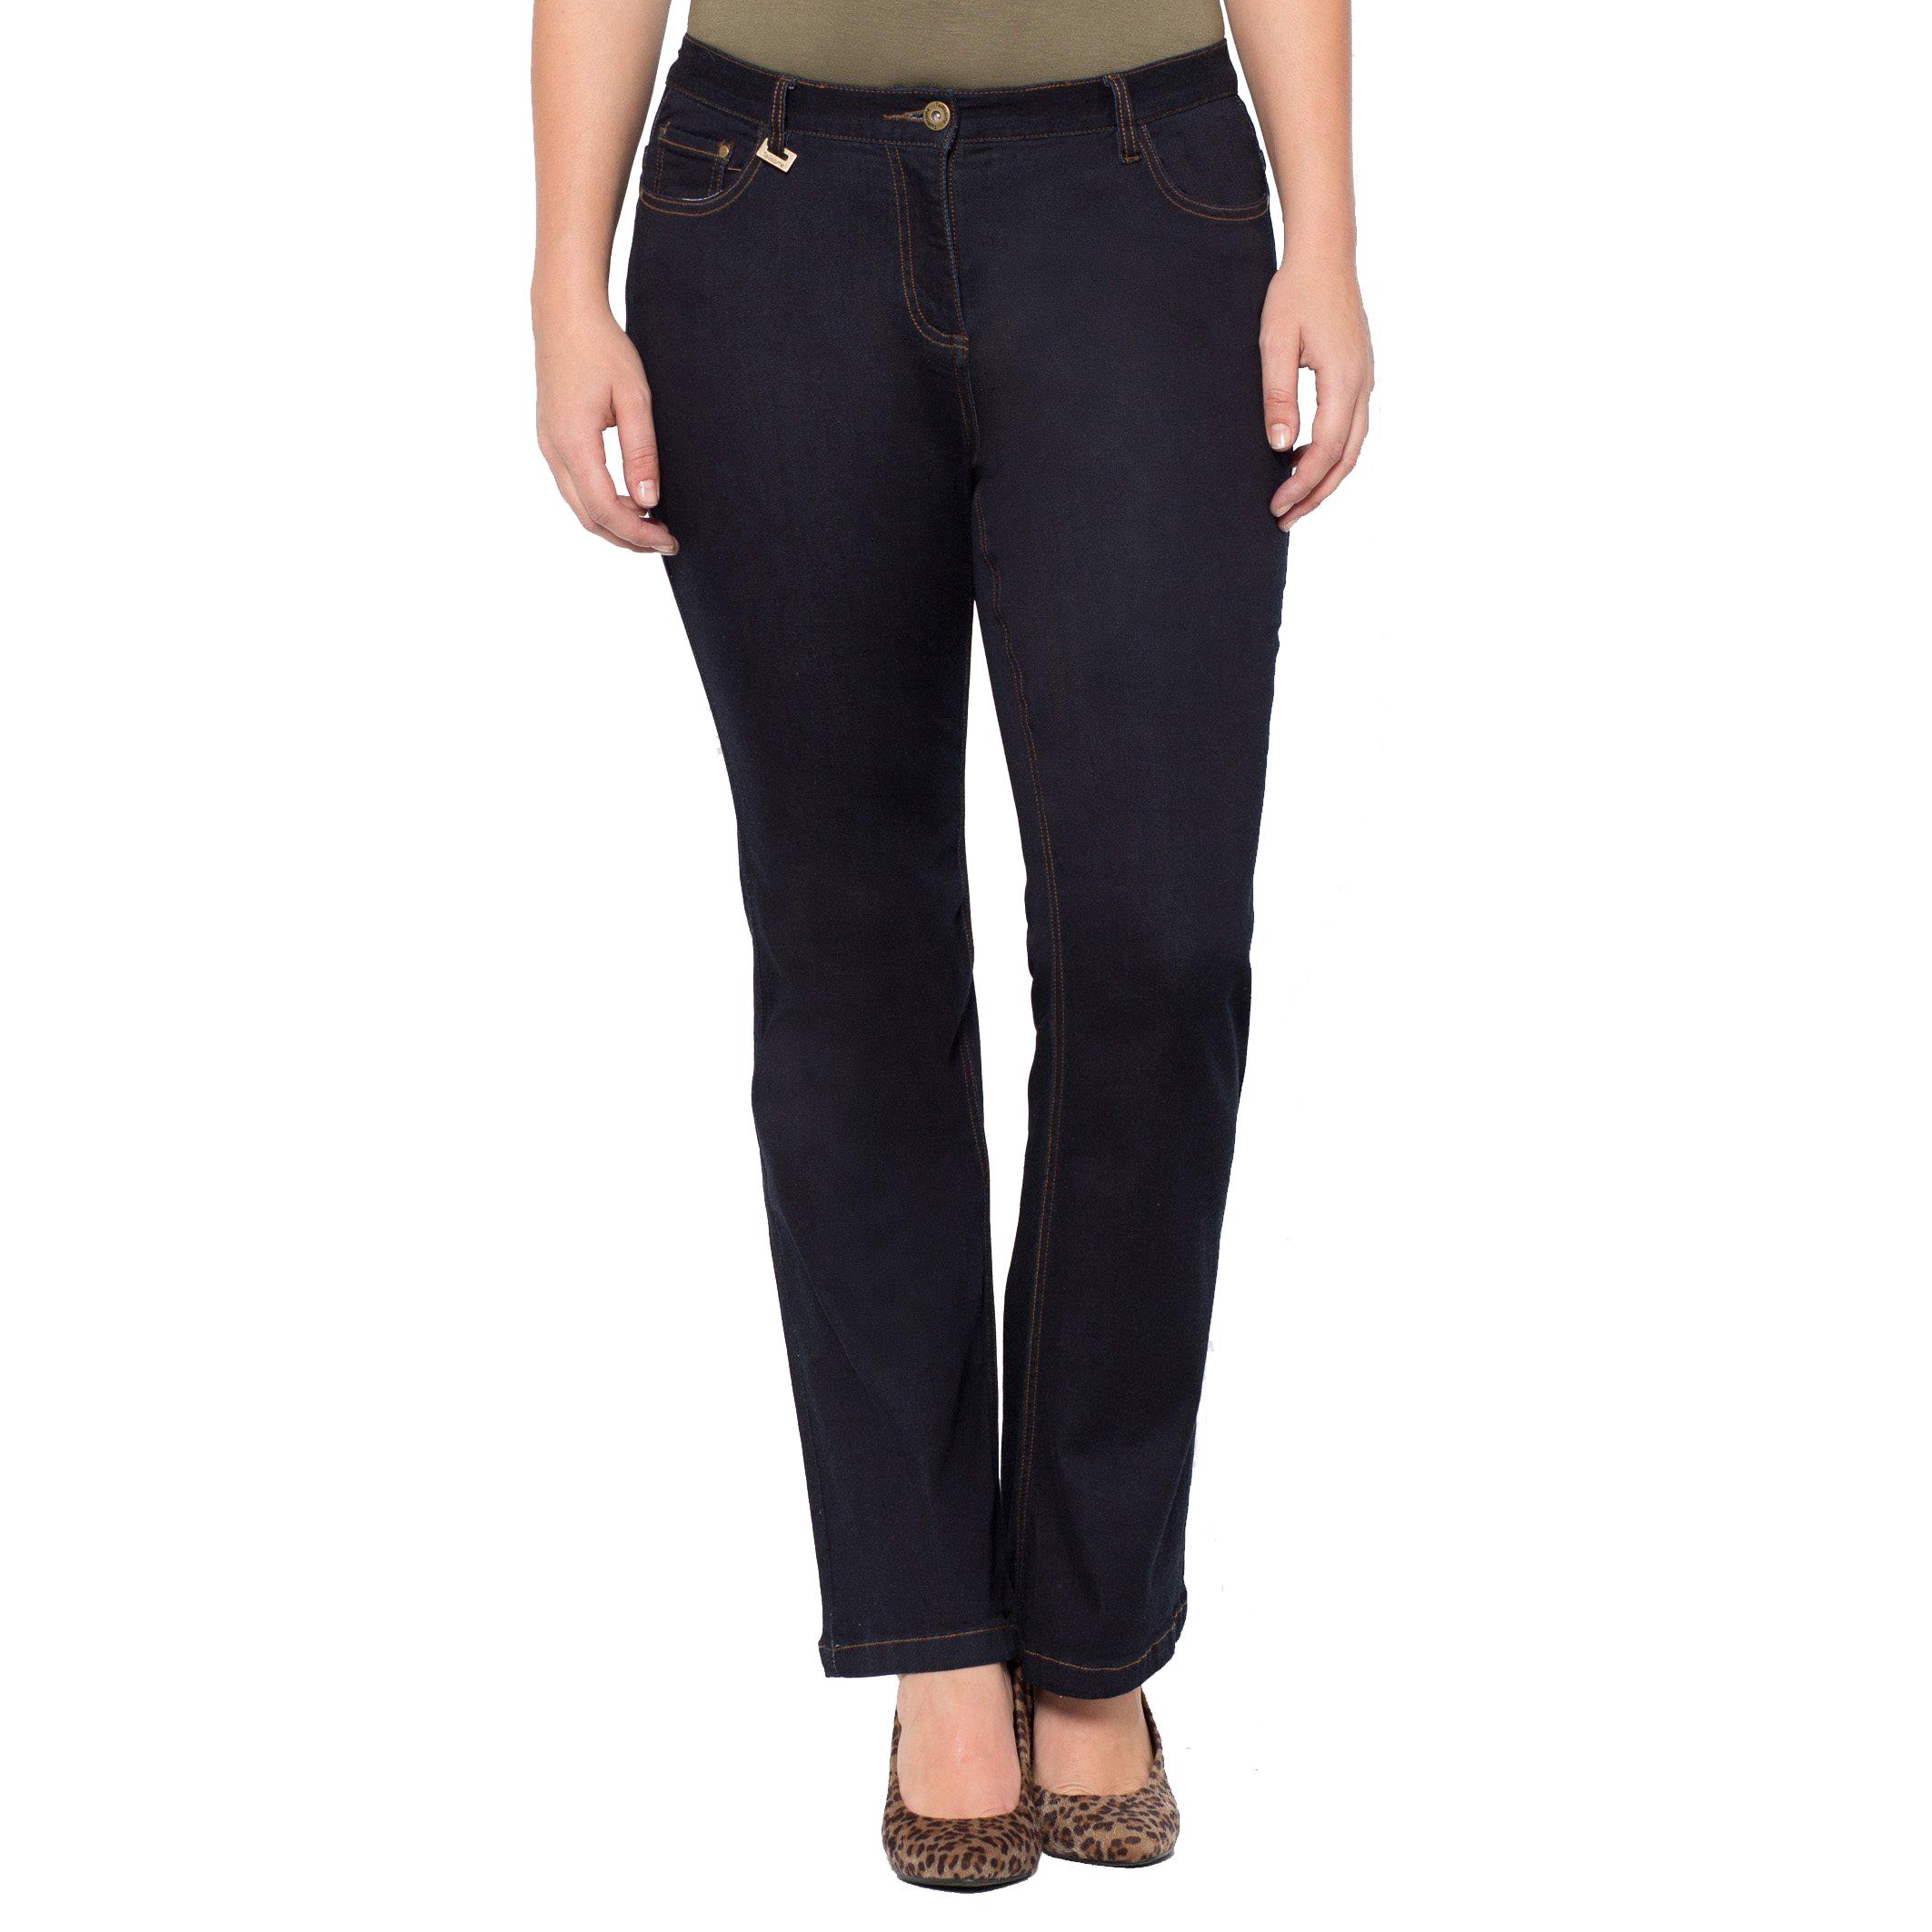 Castaluna Womens Curvy Fit Bootcut Stretch Jeans Length 31 324467049